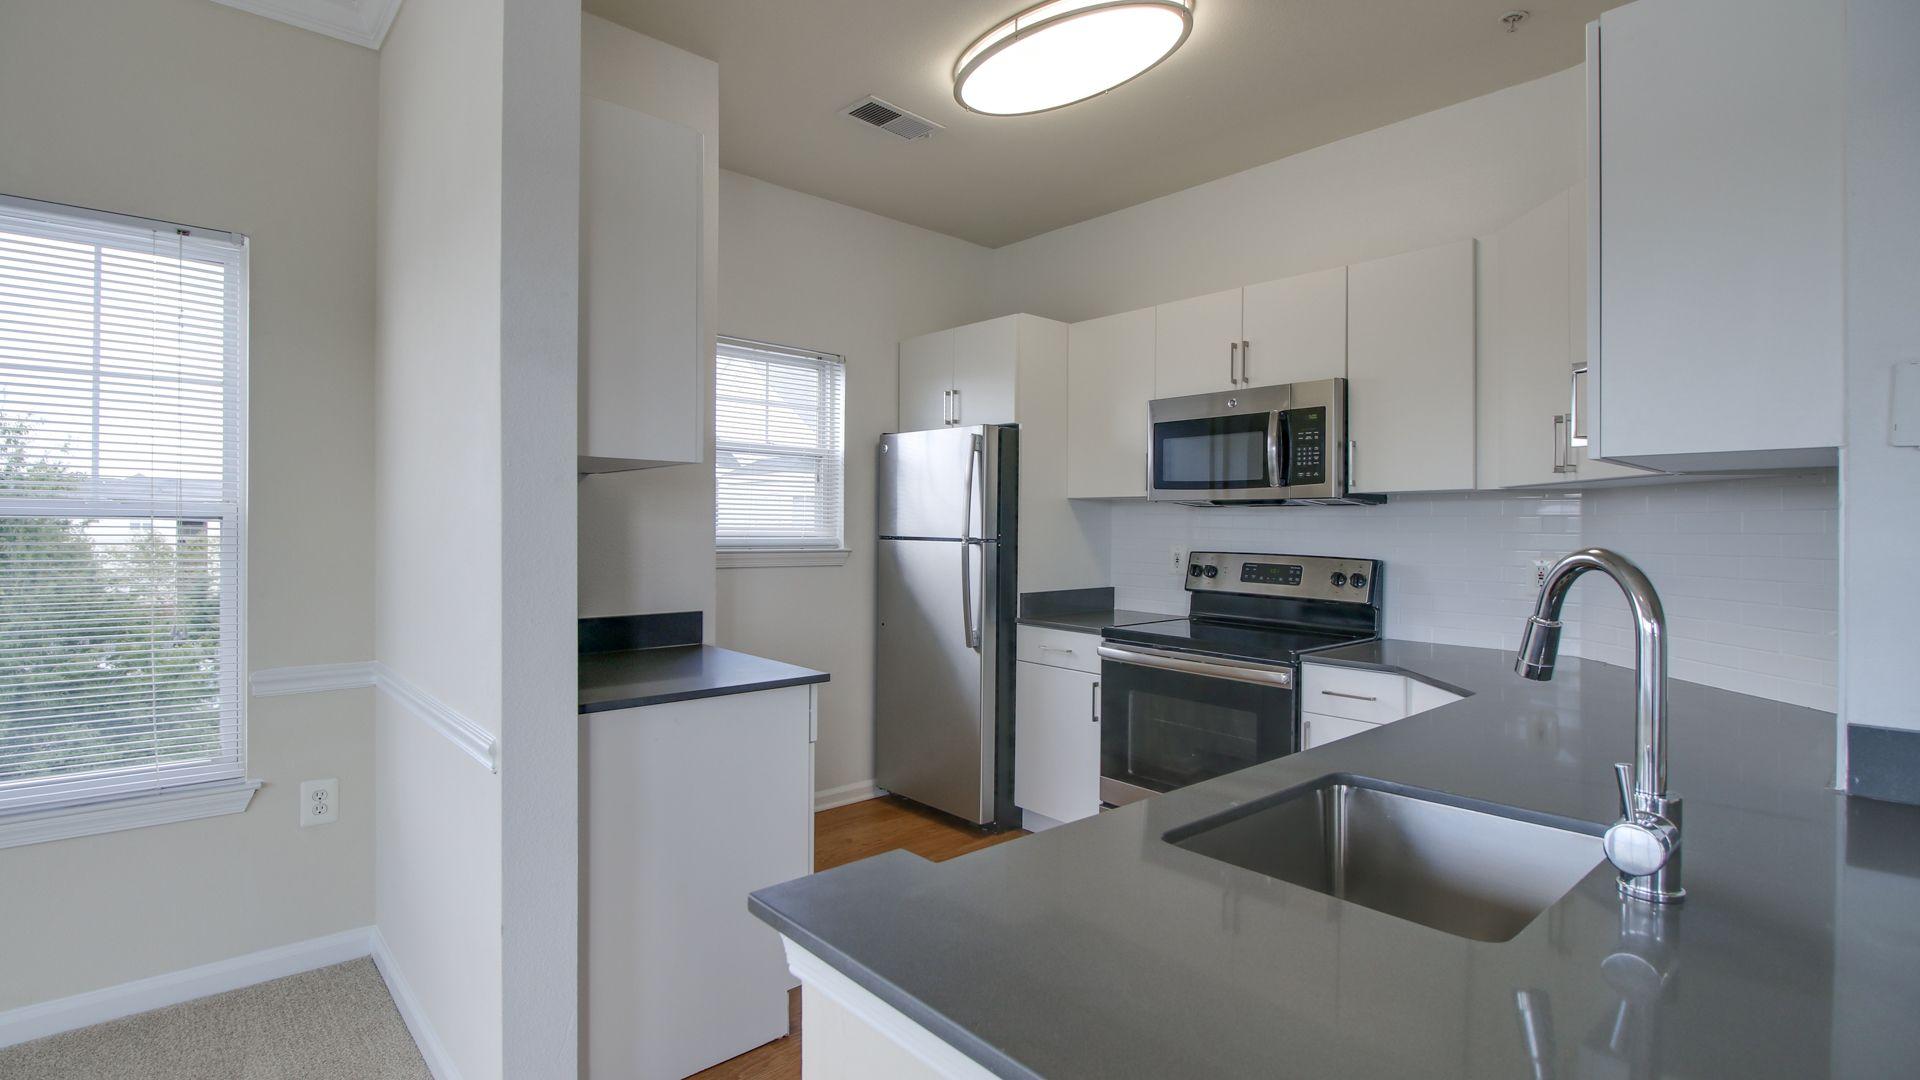 Reserve at Potomac Yard Apartments - The Lafayette Kitchen